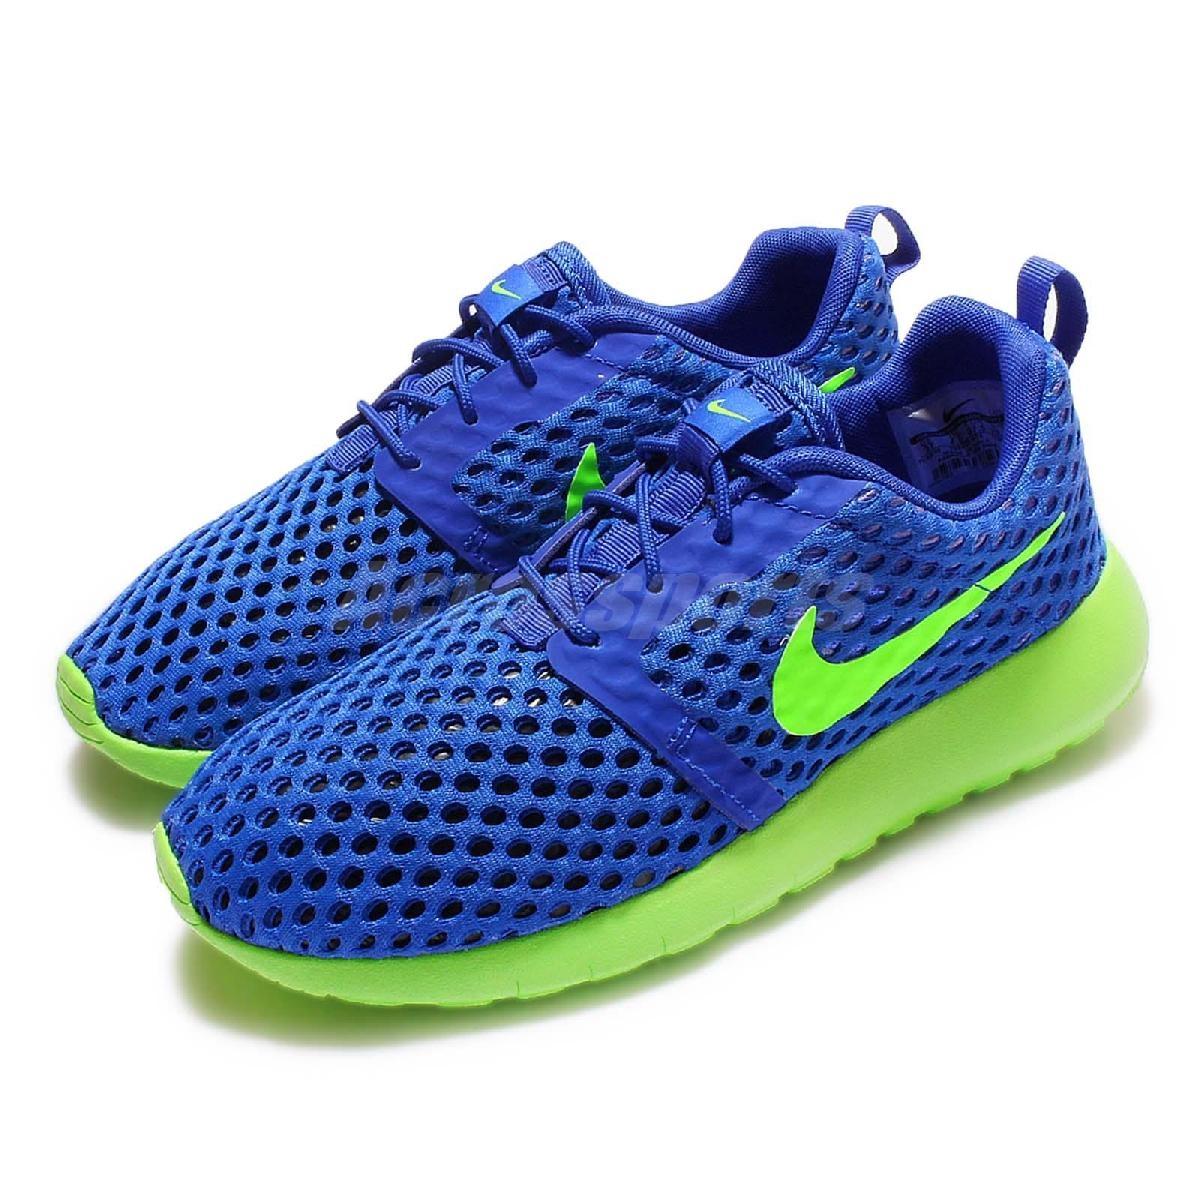 Nike休閒慢跑鞋Roshe One Flight Weight GS藍綠運動鞋女鞋大童鞋PUMP306 705485-404